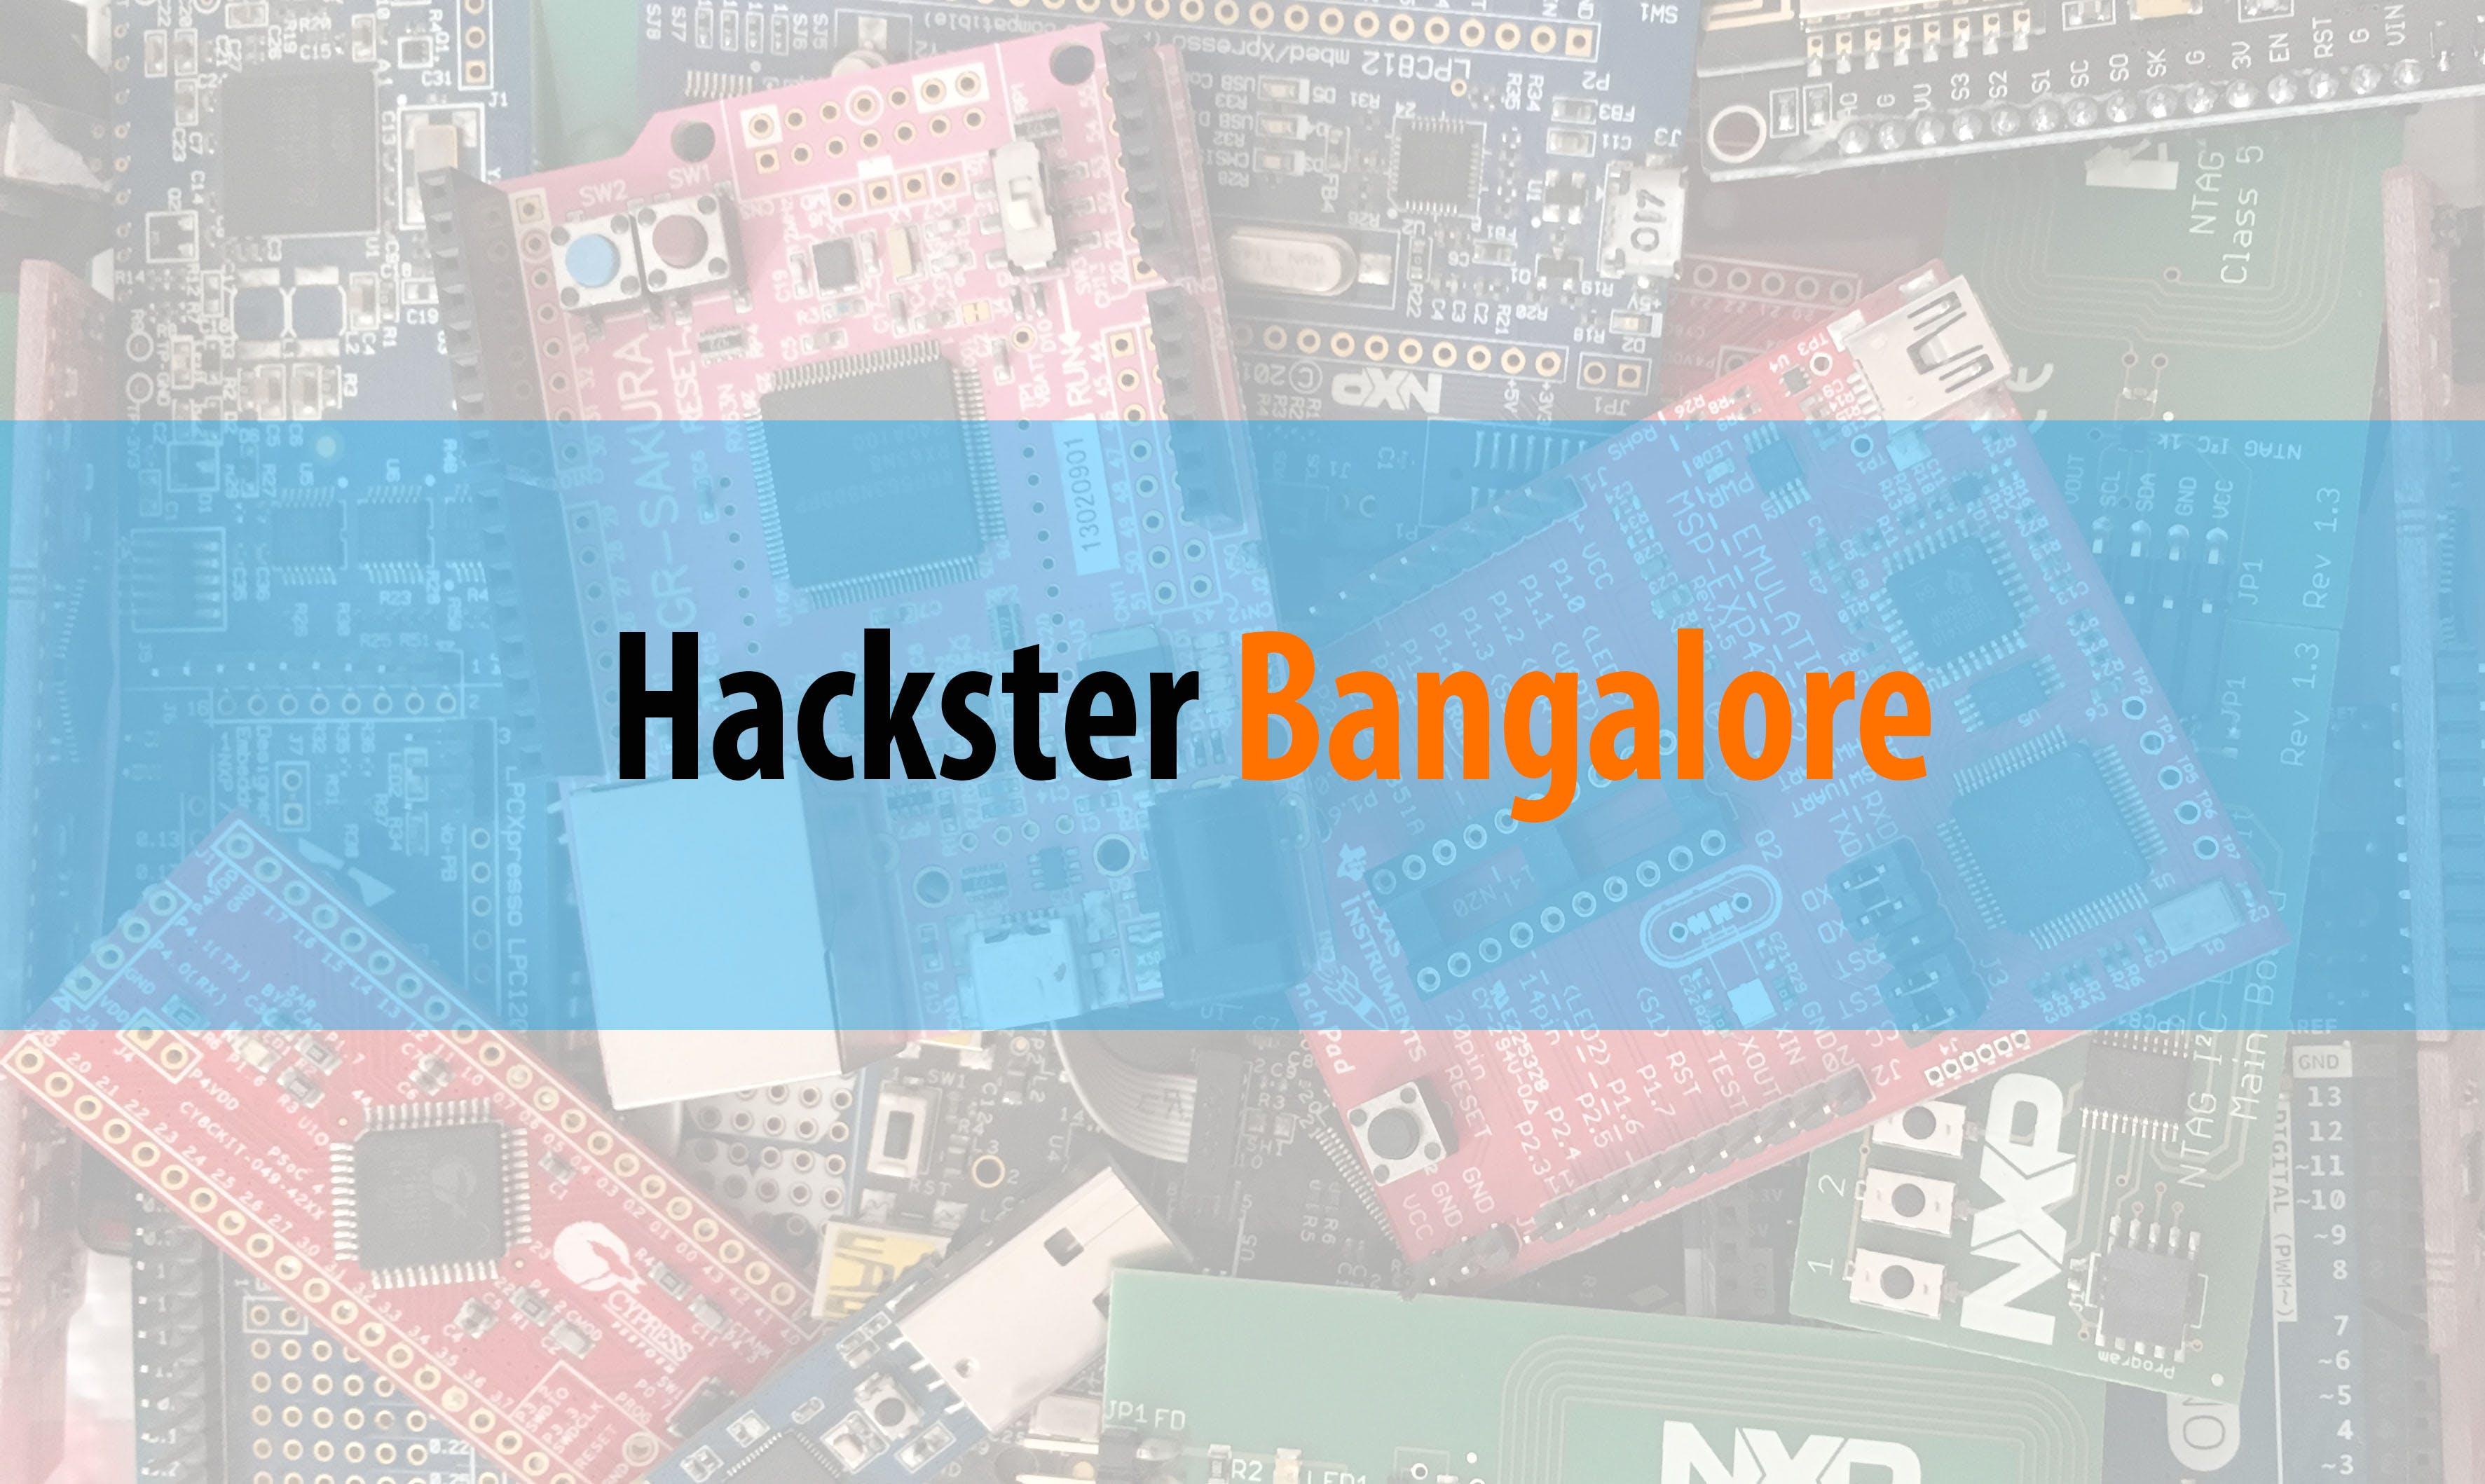 Hackster bangalore tzw4wn4jd1